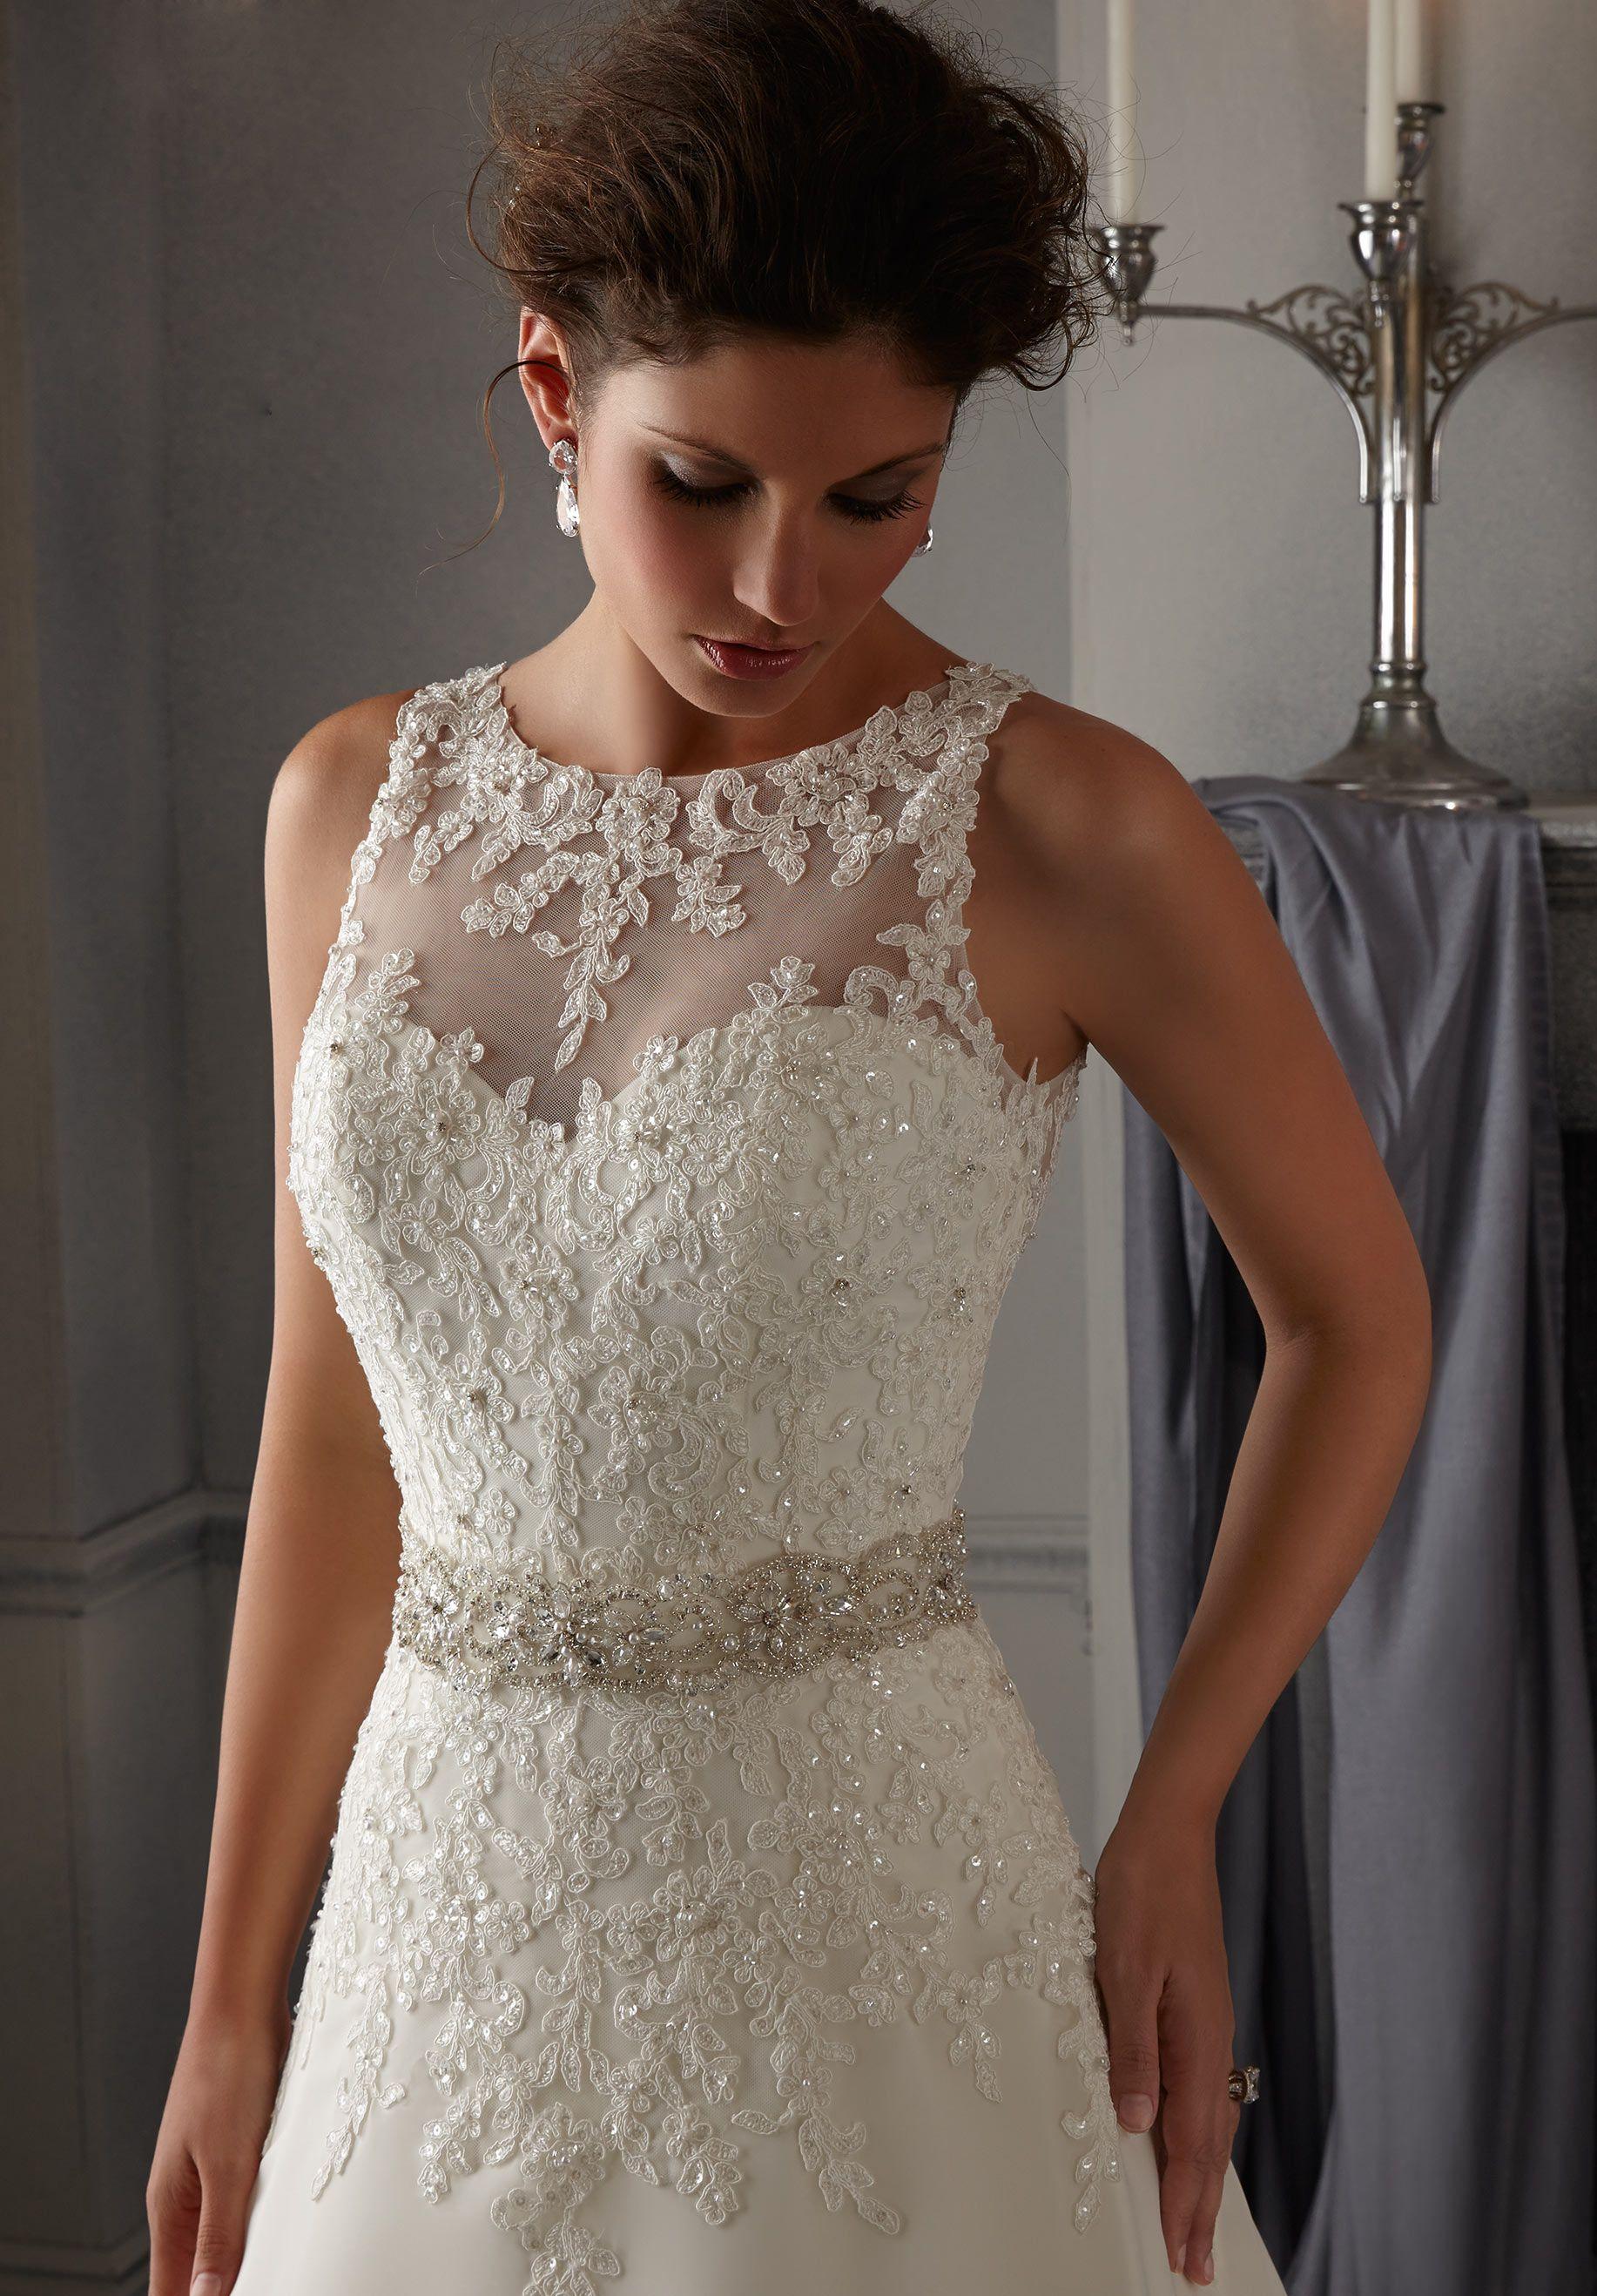 78 Best images about Bridal Accessories on Pinterest - Dress ...